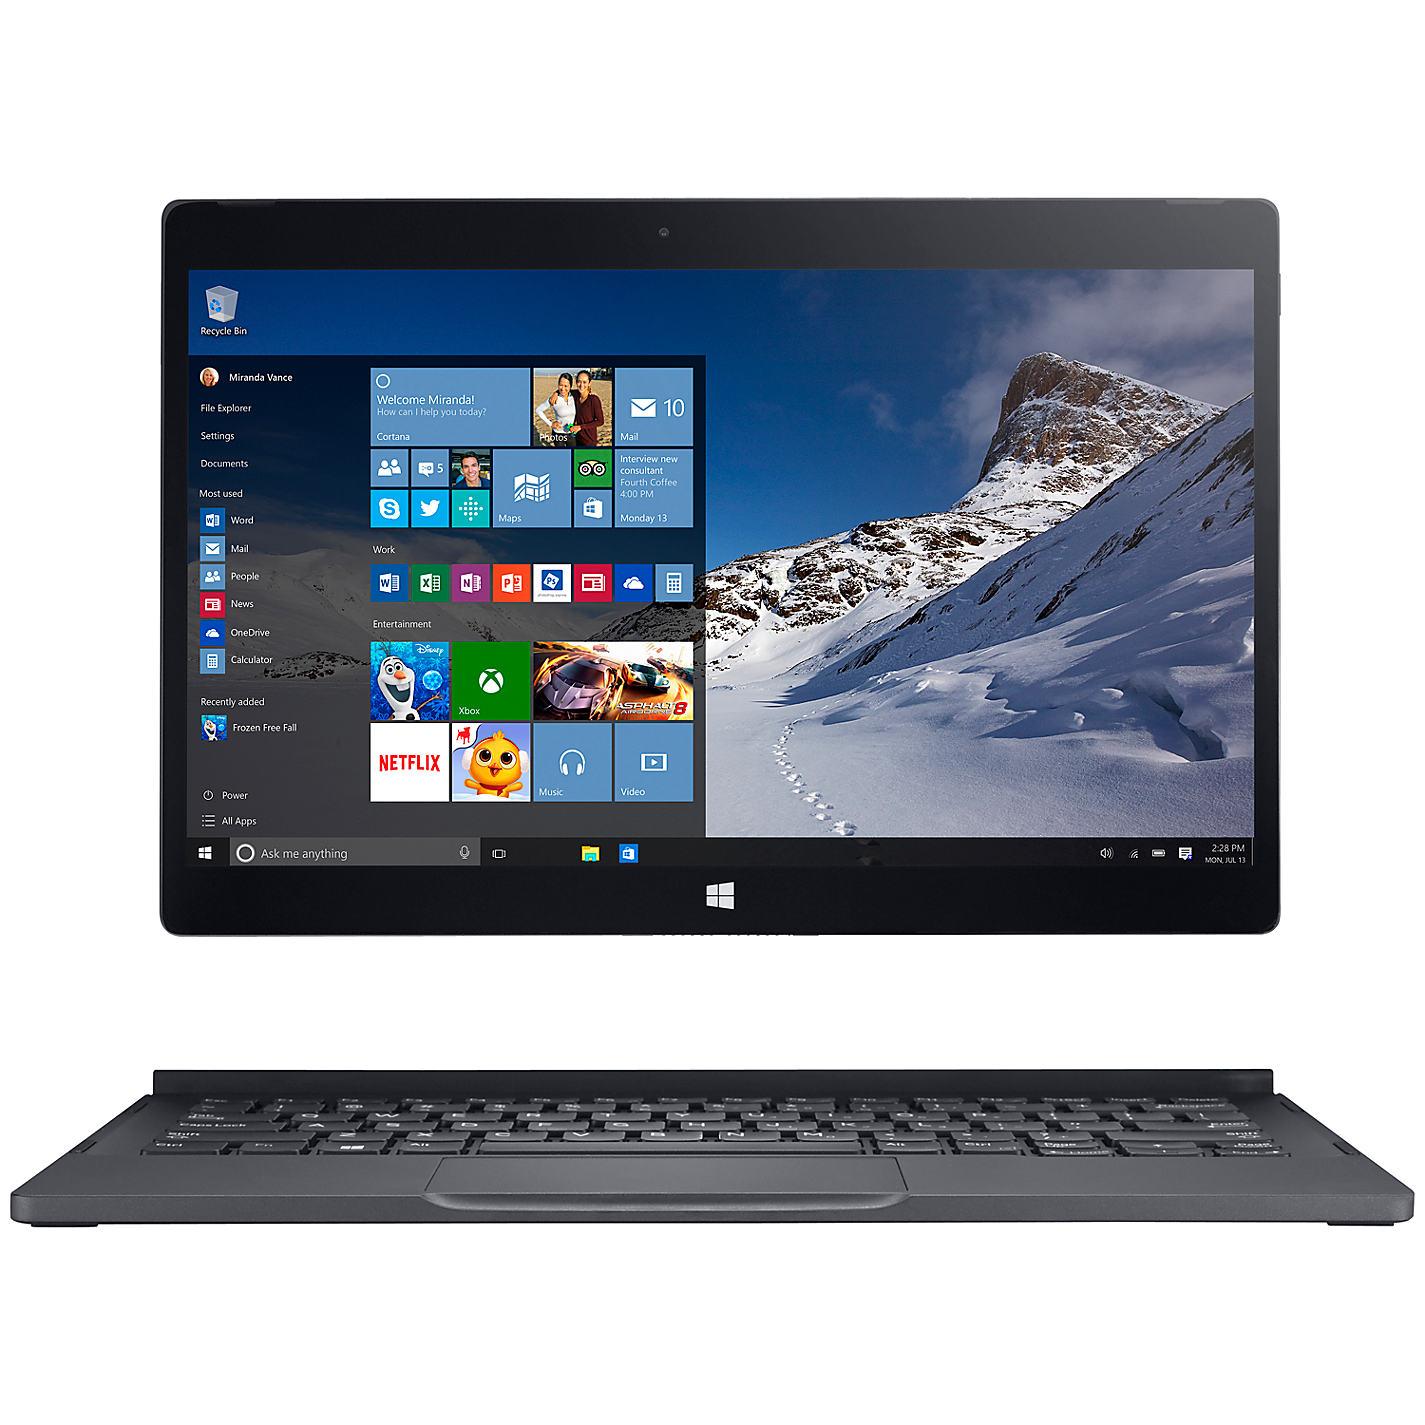 "Dell XPS 12-9250 Laptop, Intel Core M3, 128GB SSD, 4GB RAM, 12.5"" Full HD @ John Lewis £449.99"